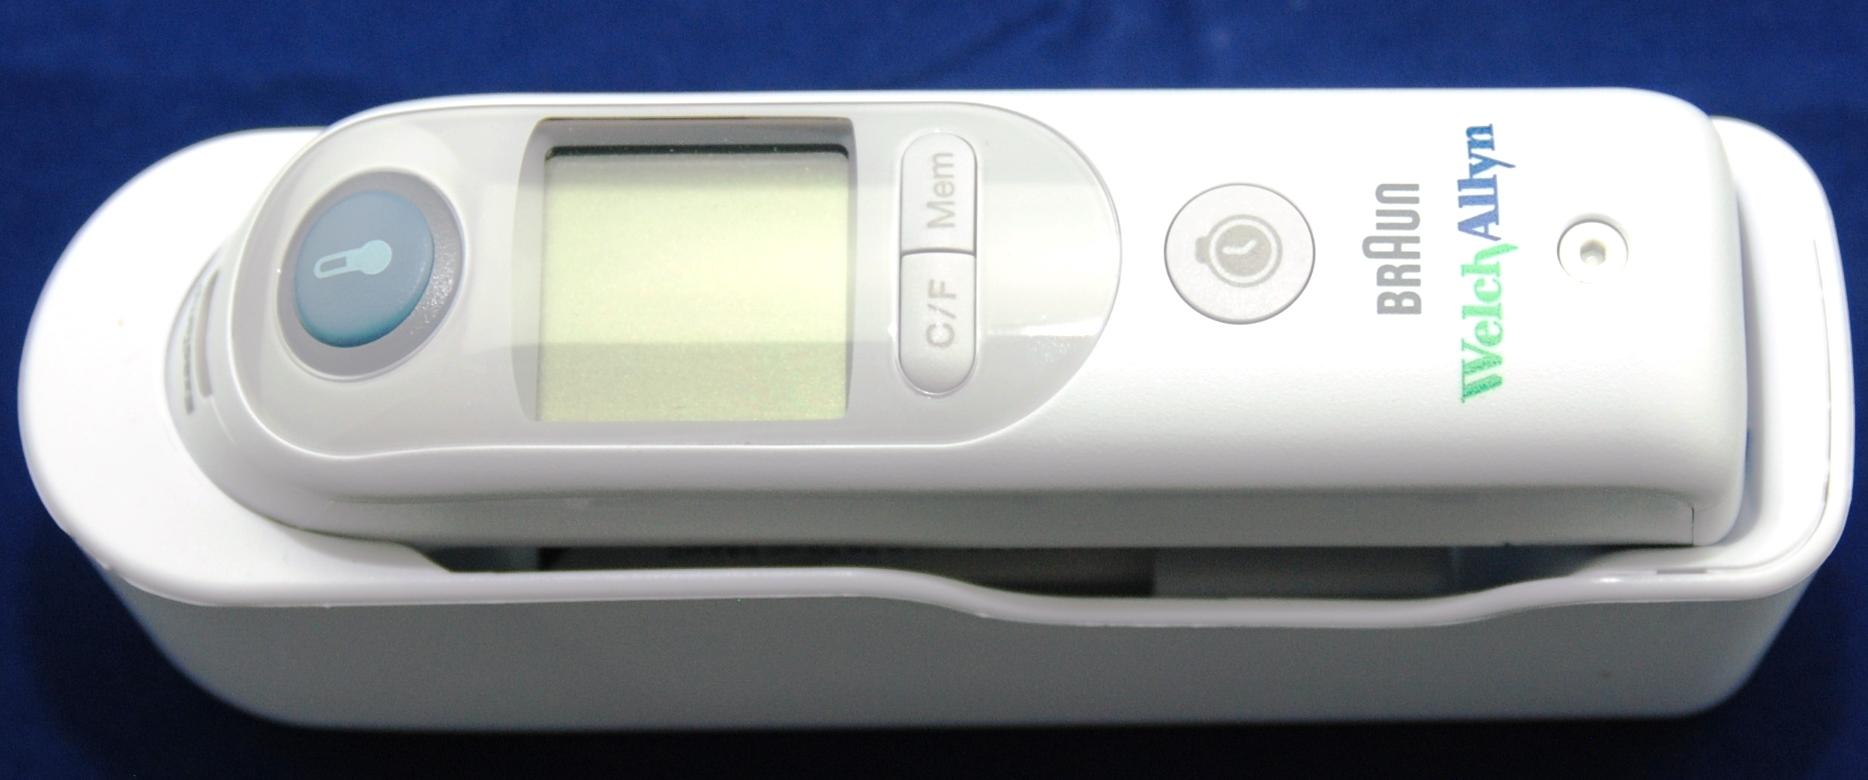 Messgeräte & Tests Digitales Fieberthermometer Fiebermesser Thermometer Fieber